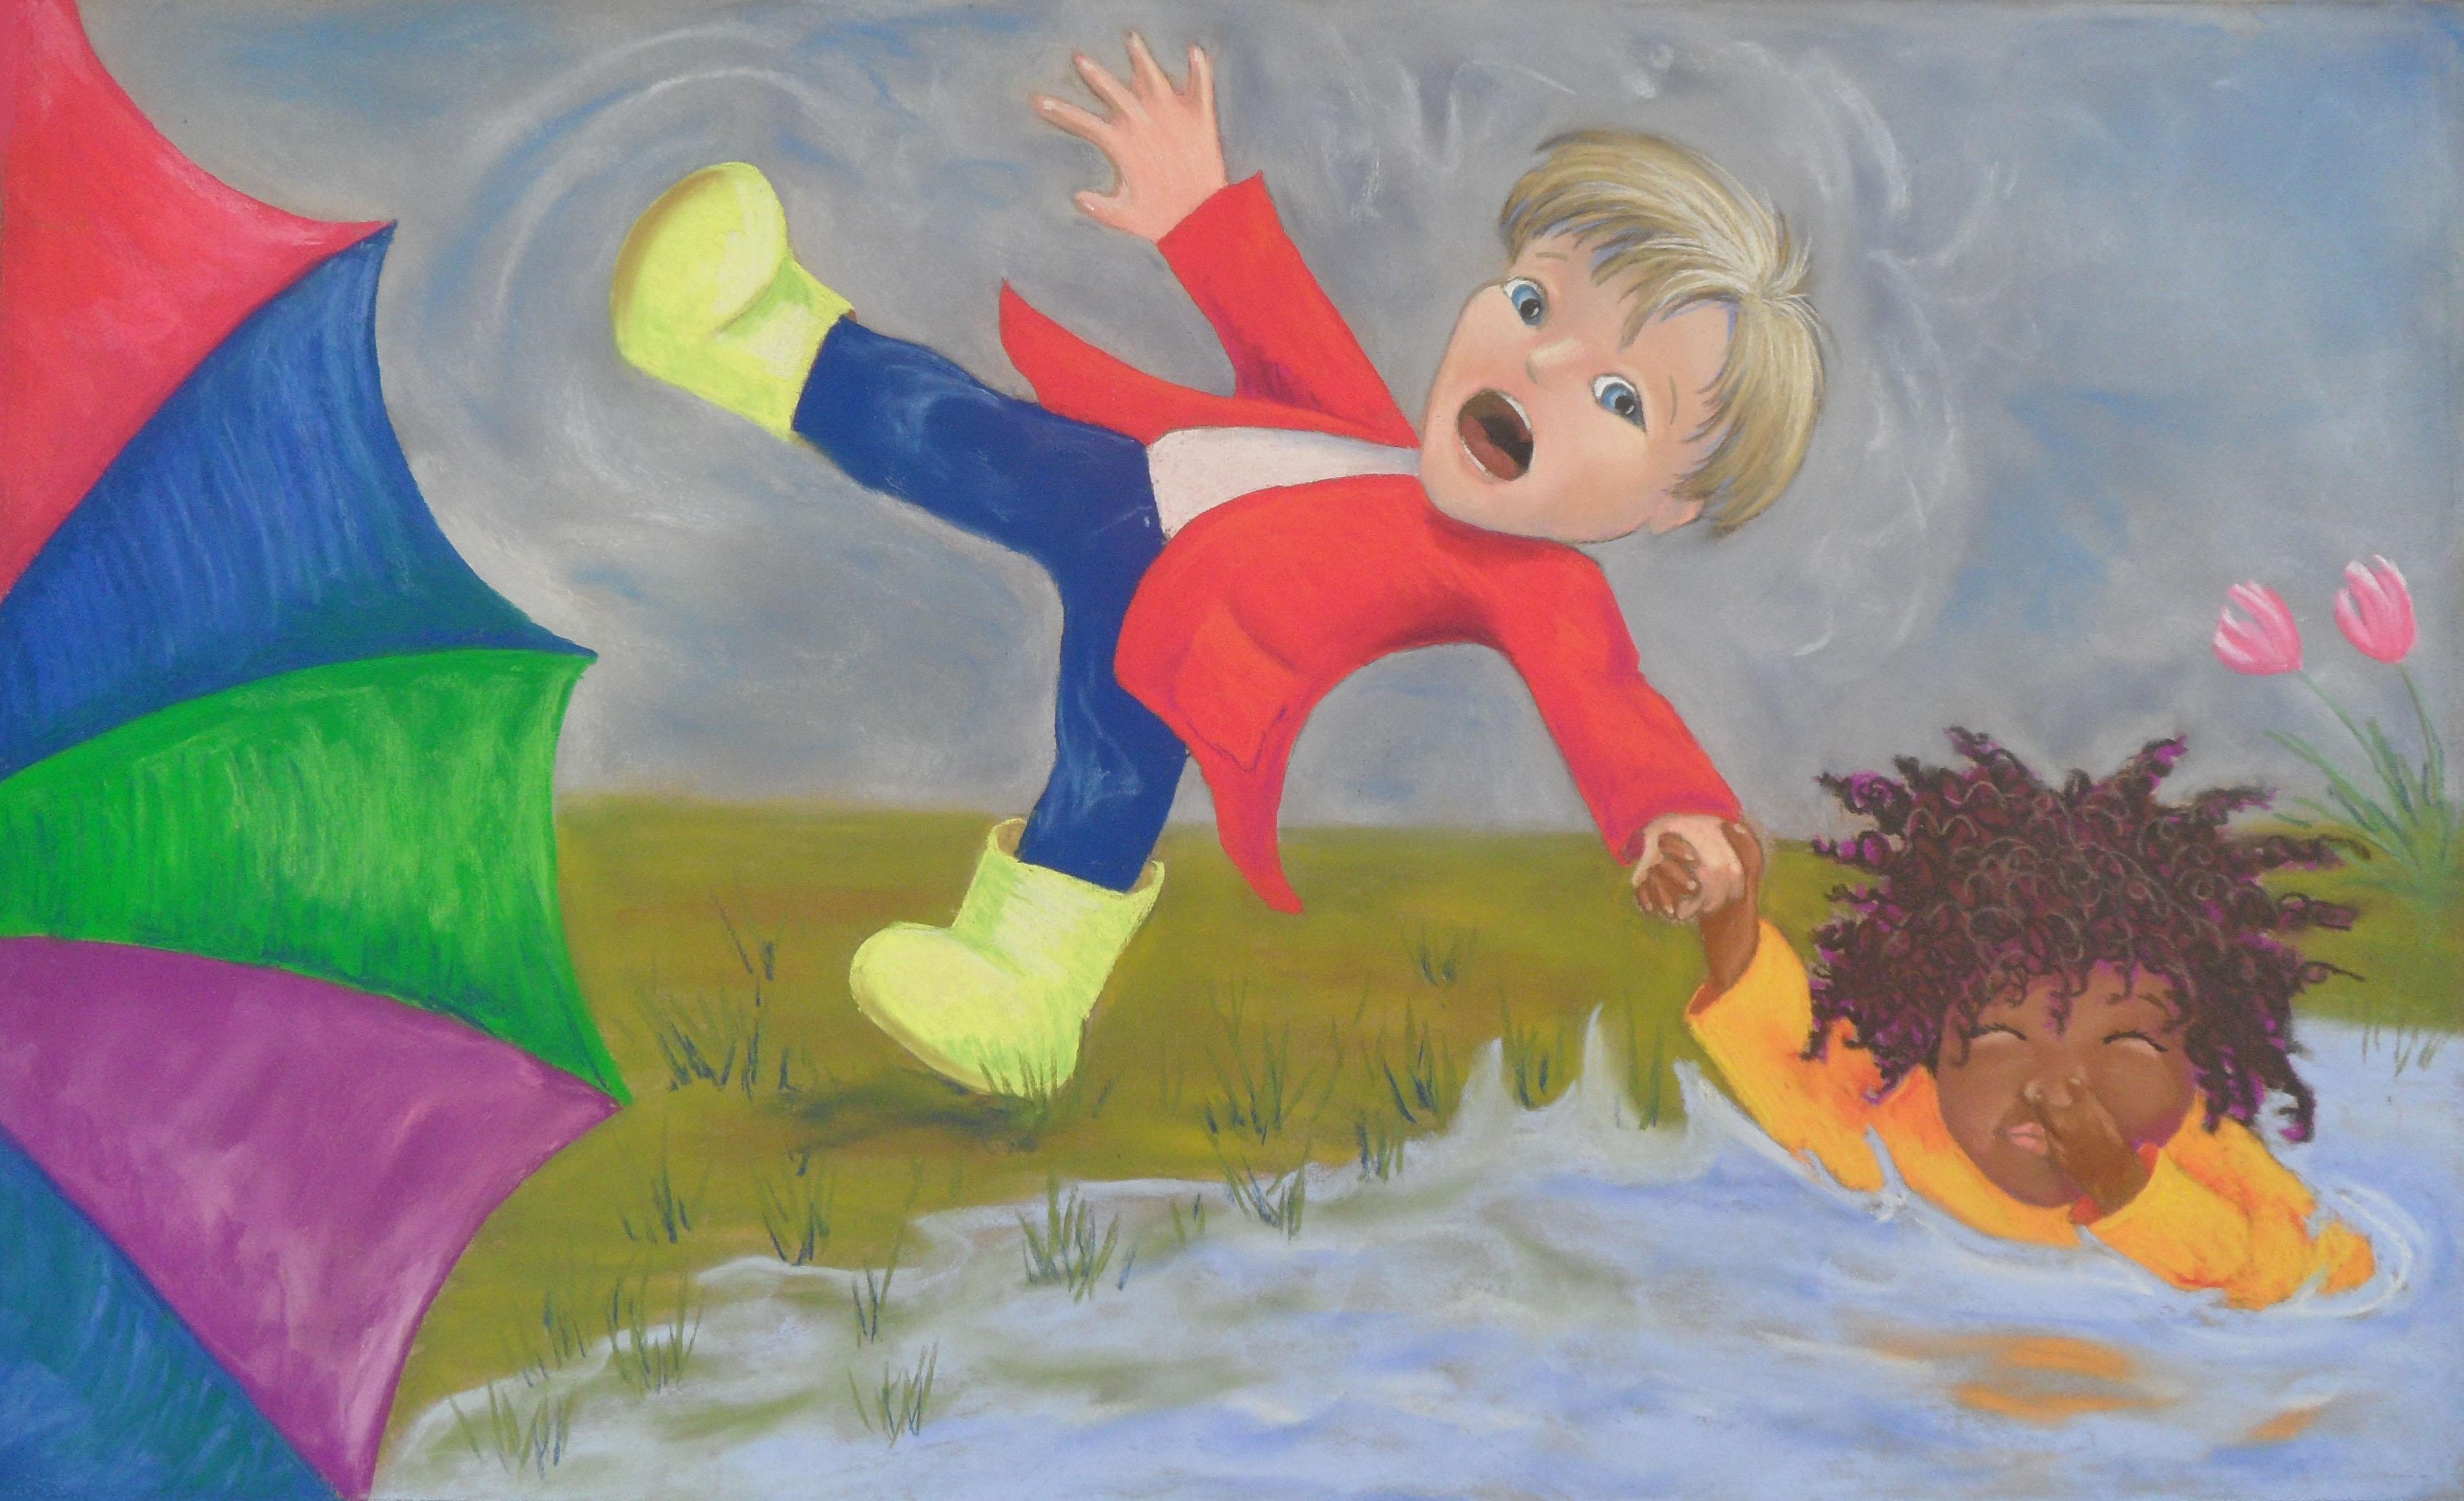 2-6-14 kids and art portfolio 023.jpg